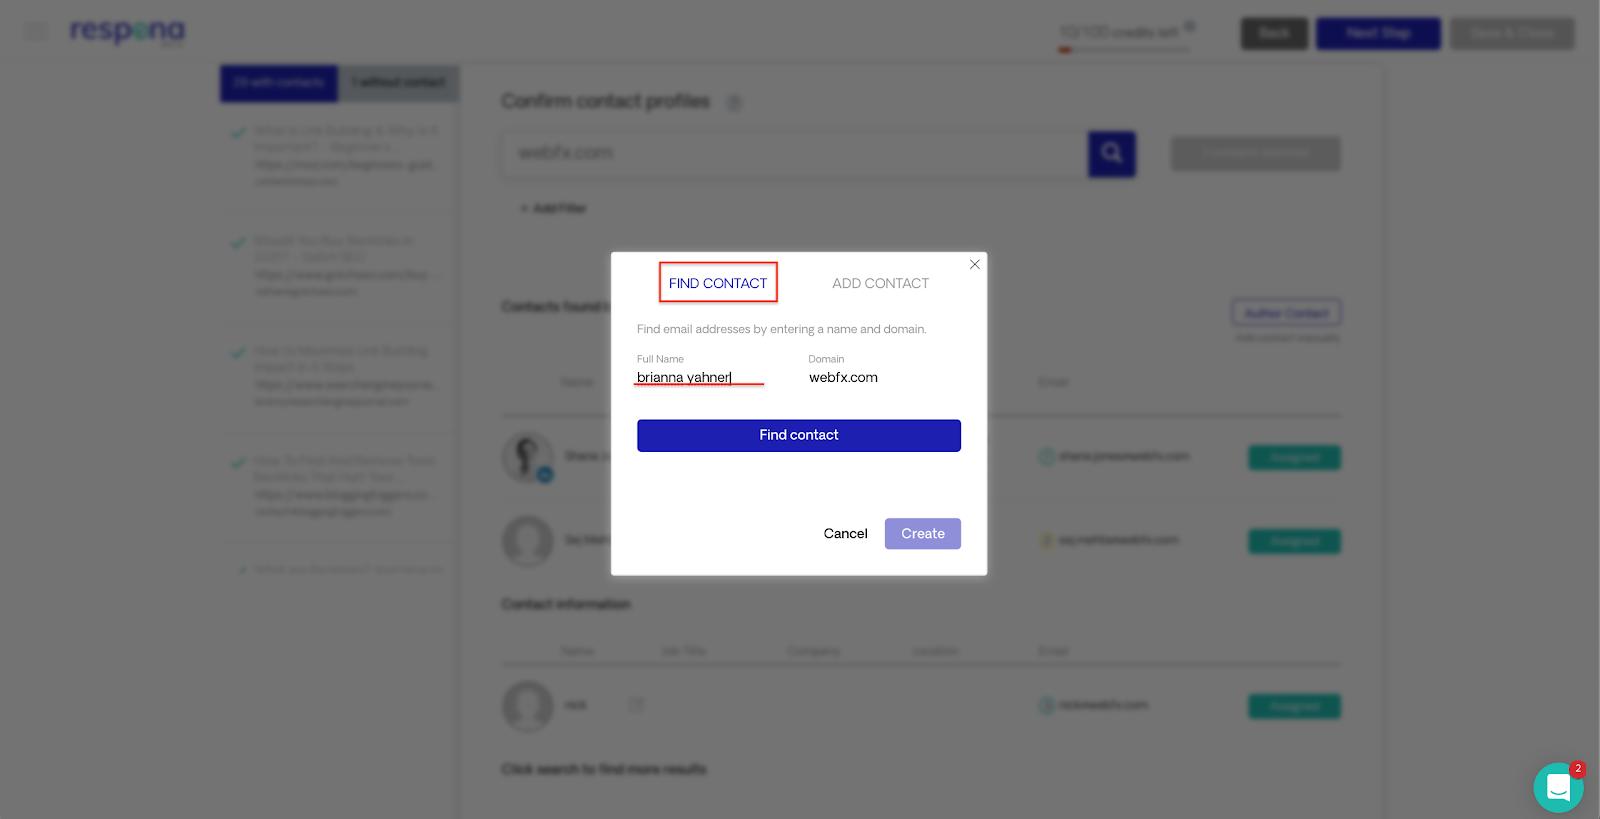 Verifying email addresses